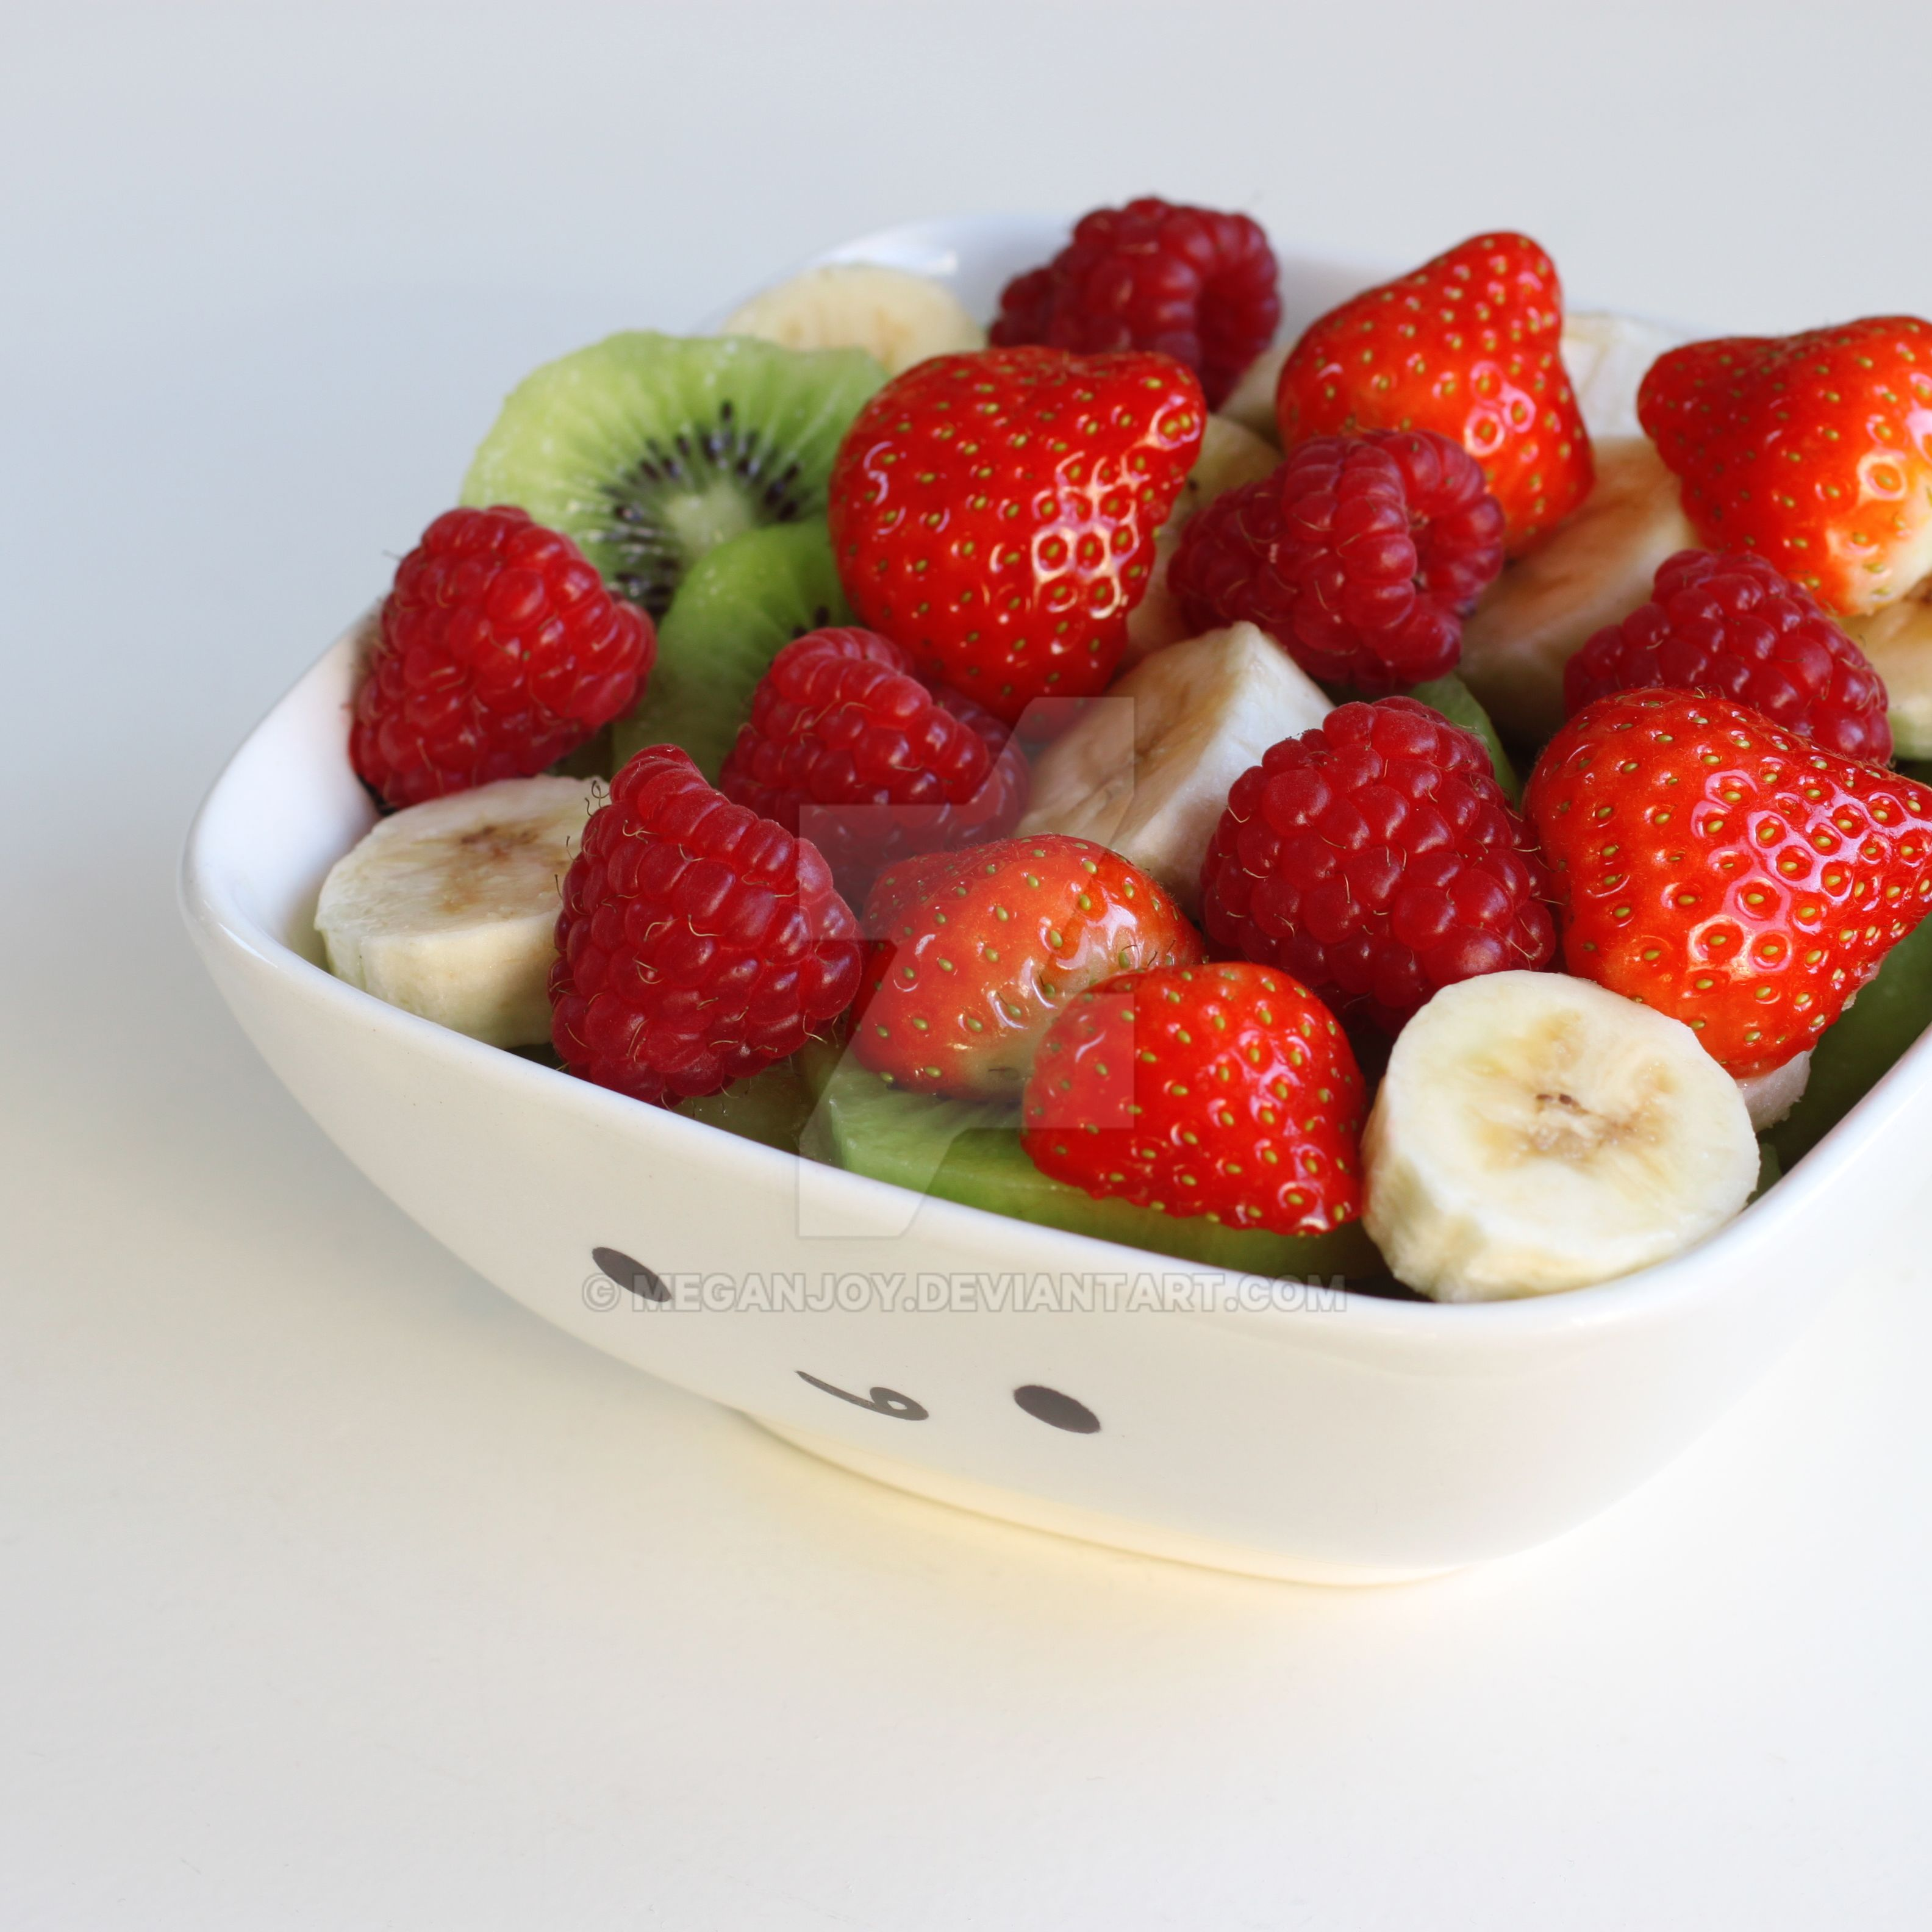 Big size fruit by meganjoy